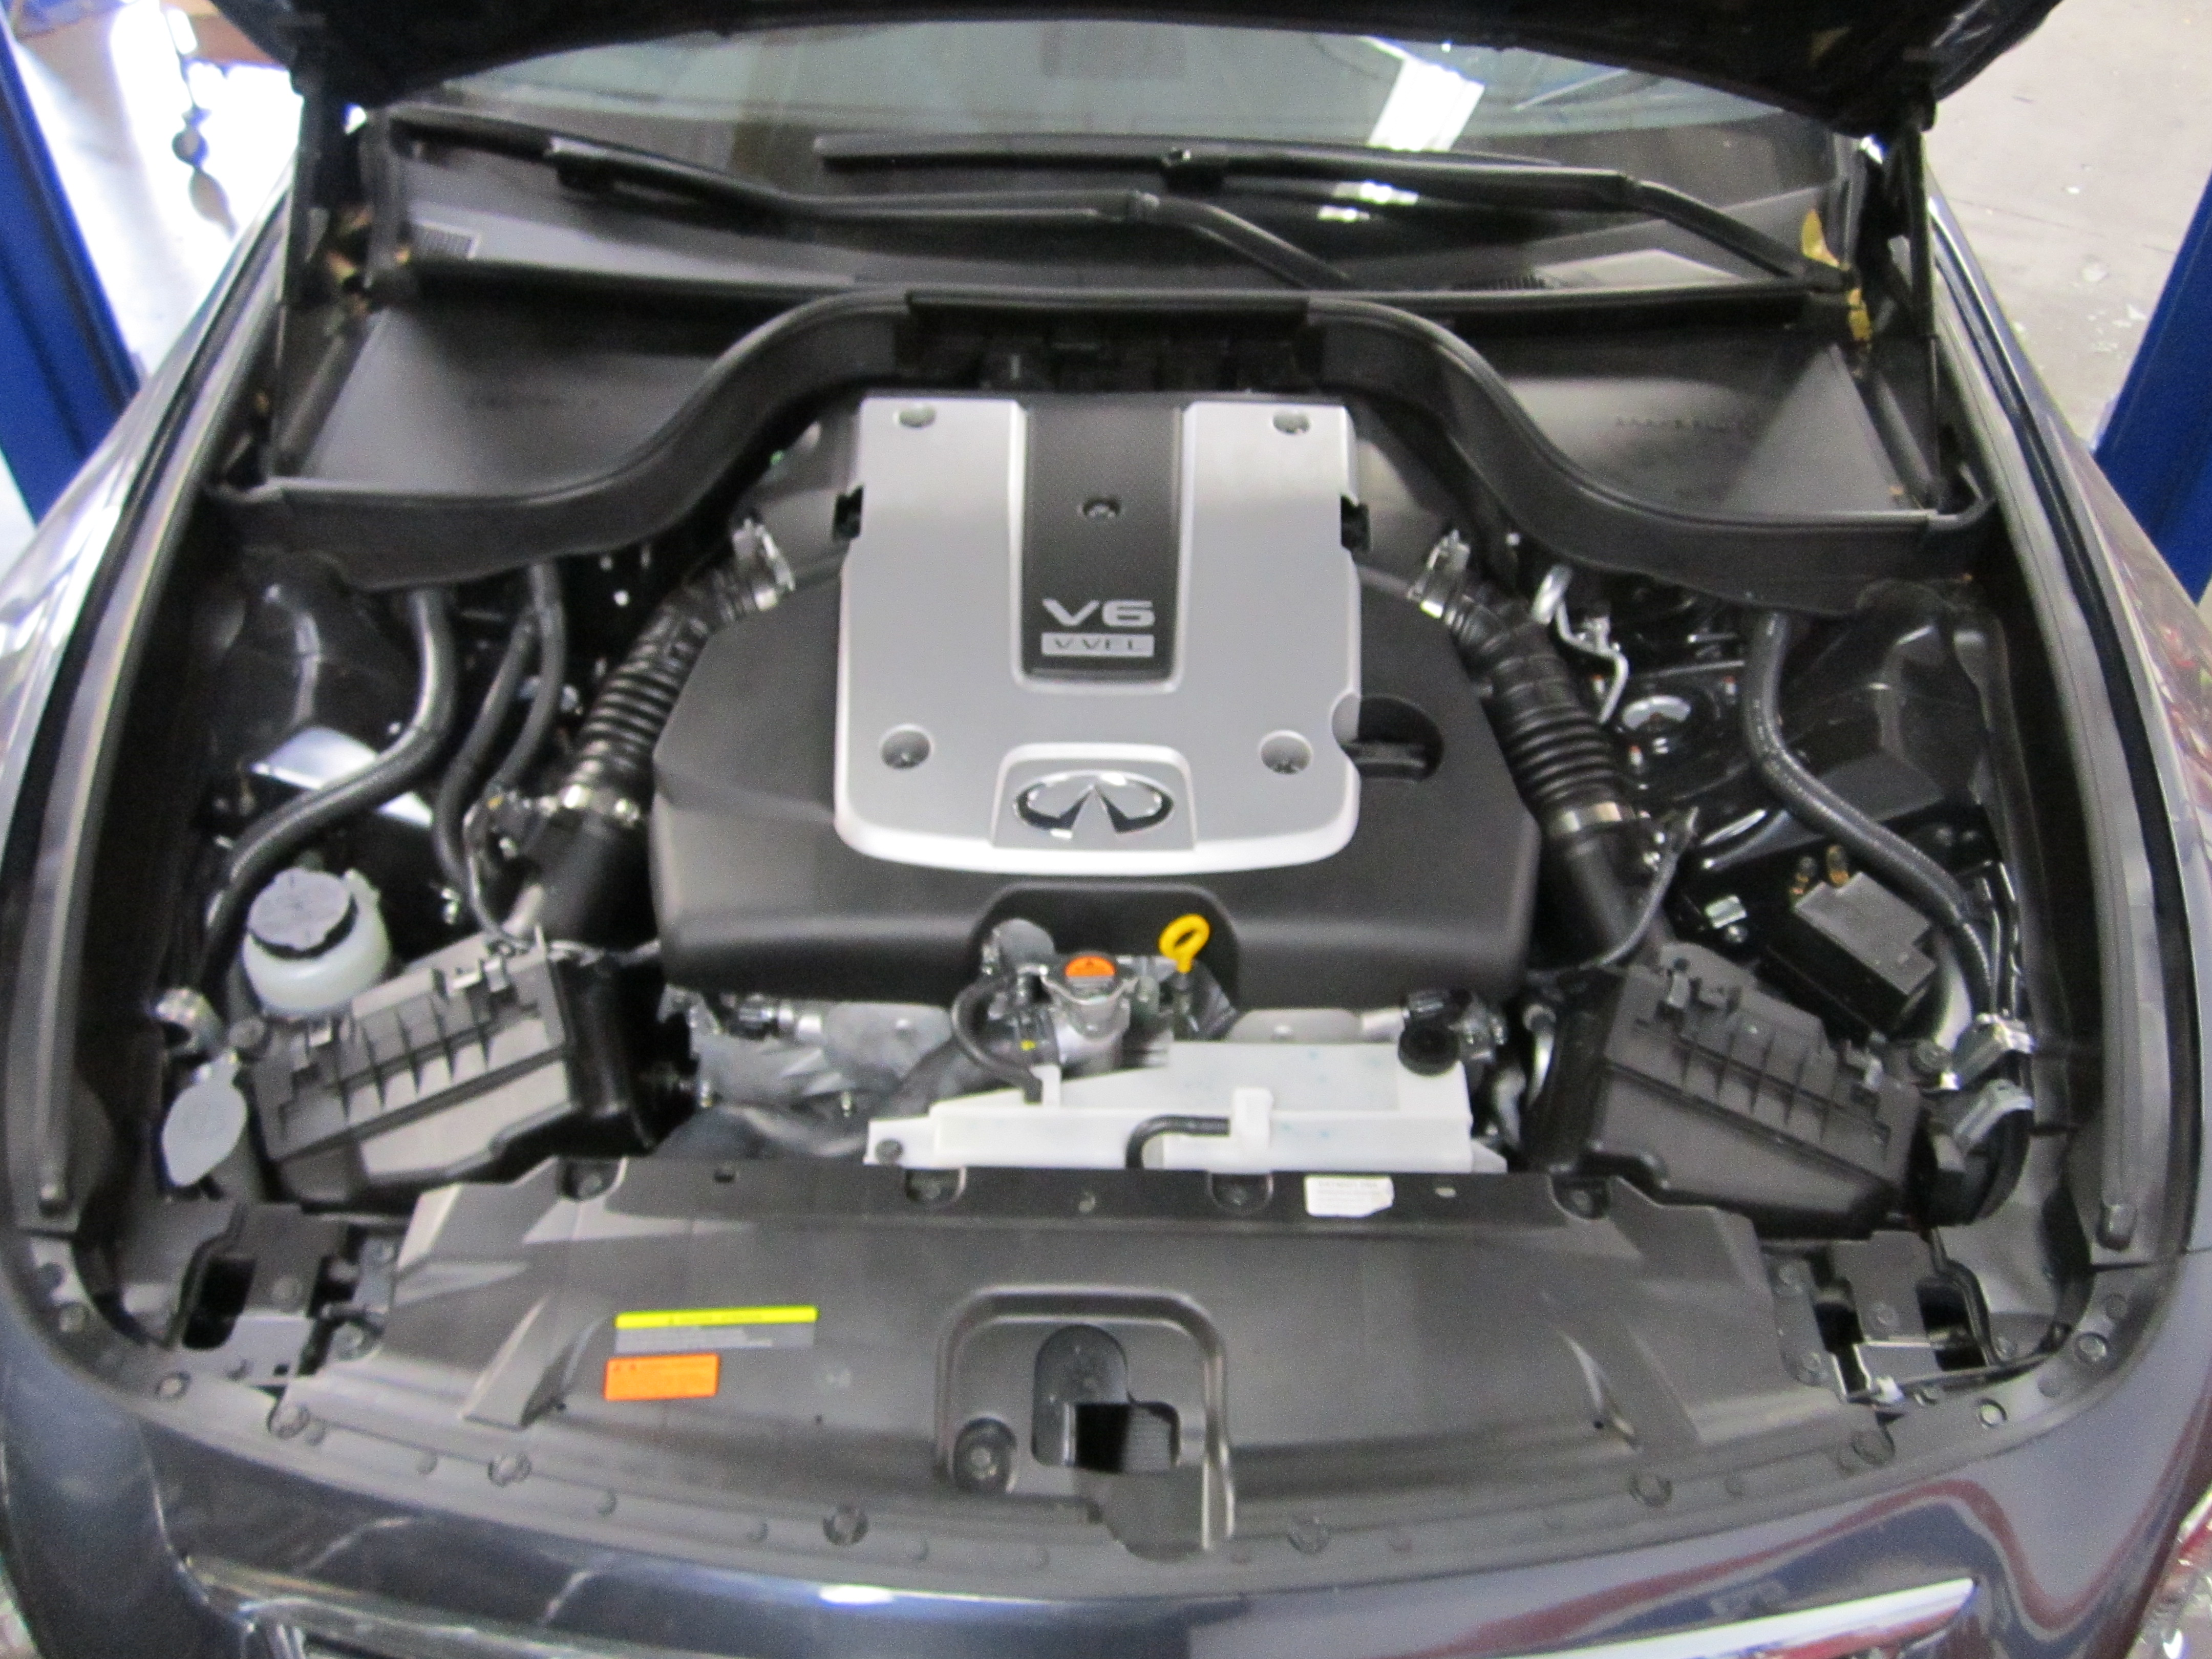 removing 2012 infiniti g37 engine 2012 used infiniti g37 sedan certified g37x awd sedan. Black Bedroom Furniture Sets. Home Design Ideas